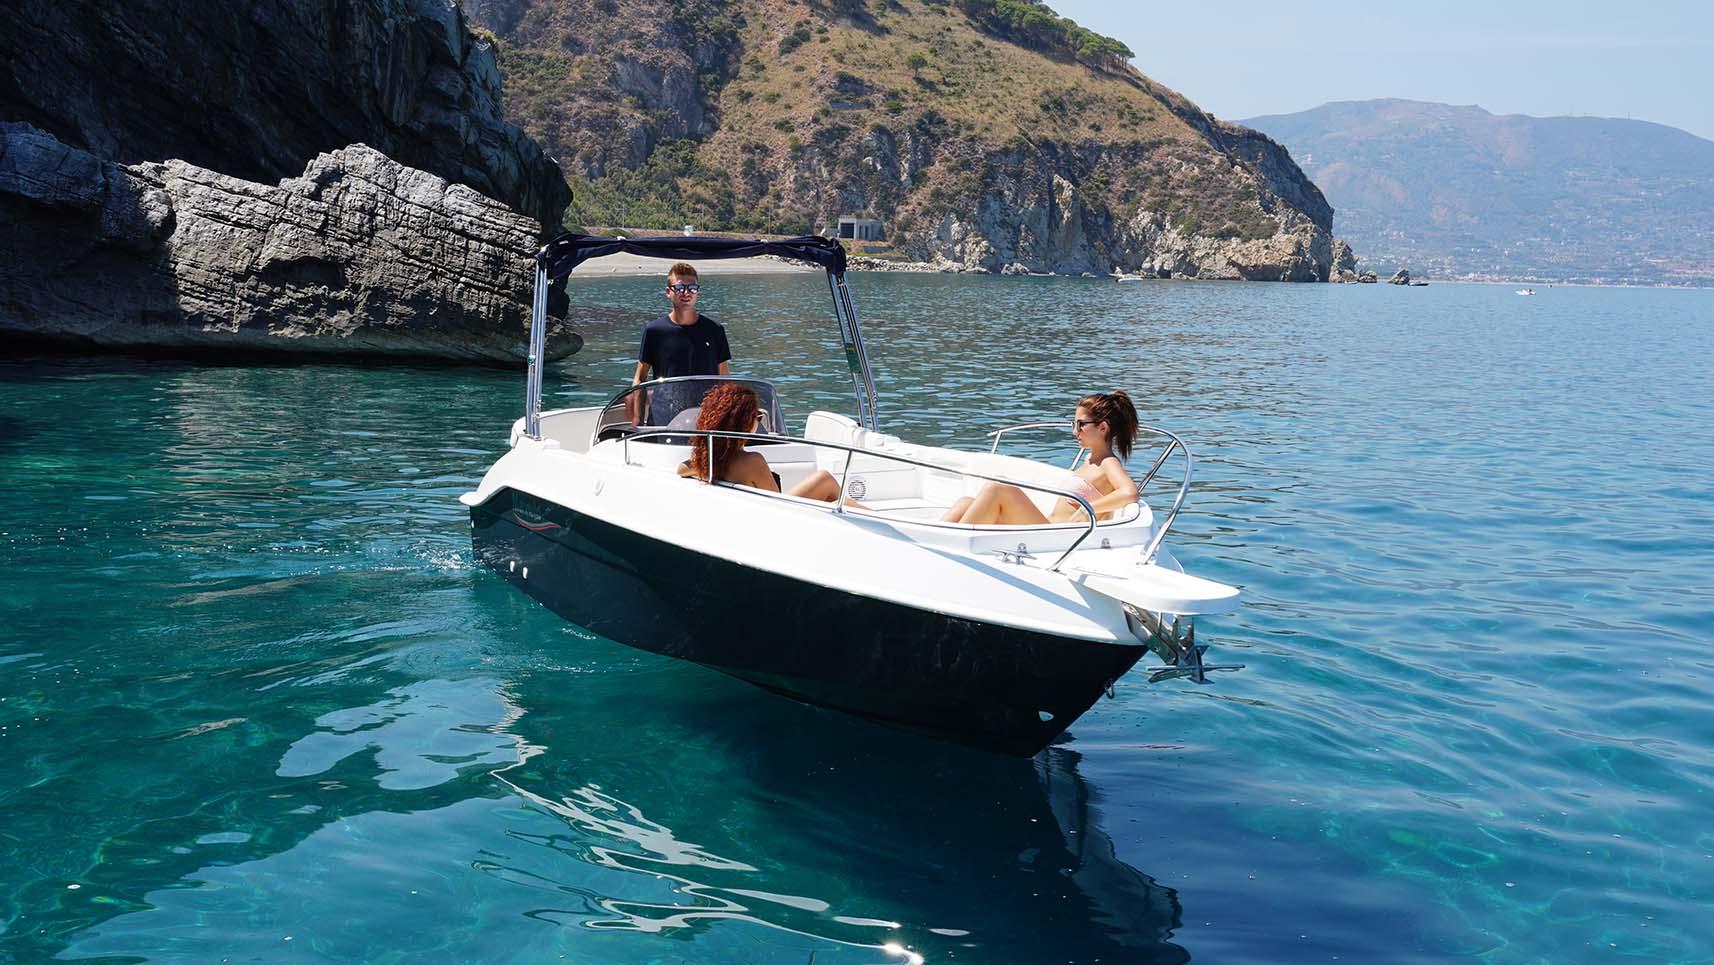 barca open marinello companymarine venezia yamaha